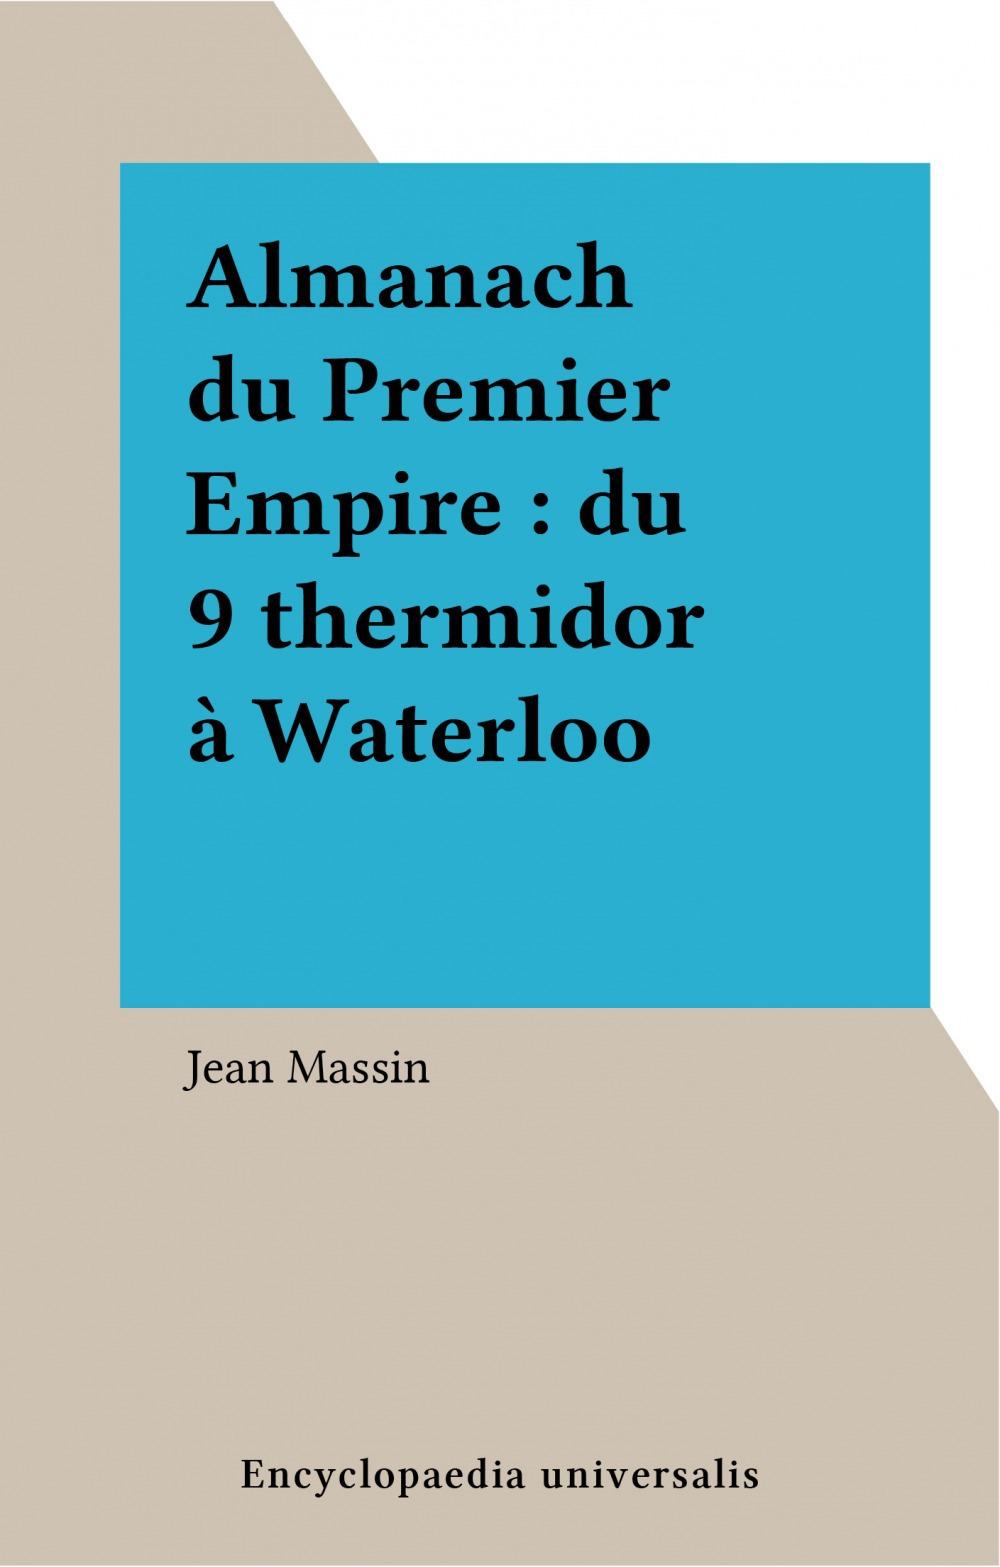 Almanach du Premier Empire : du 9 thermidor à Waterloo  - Jean Massin